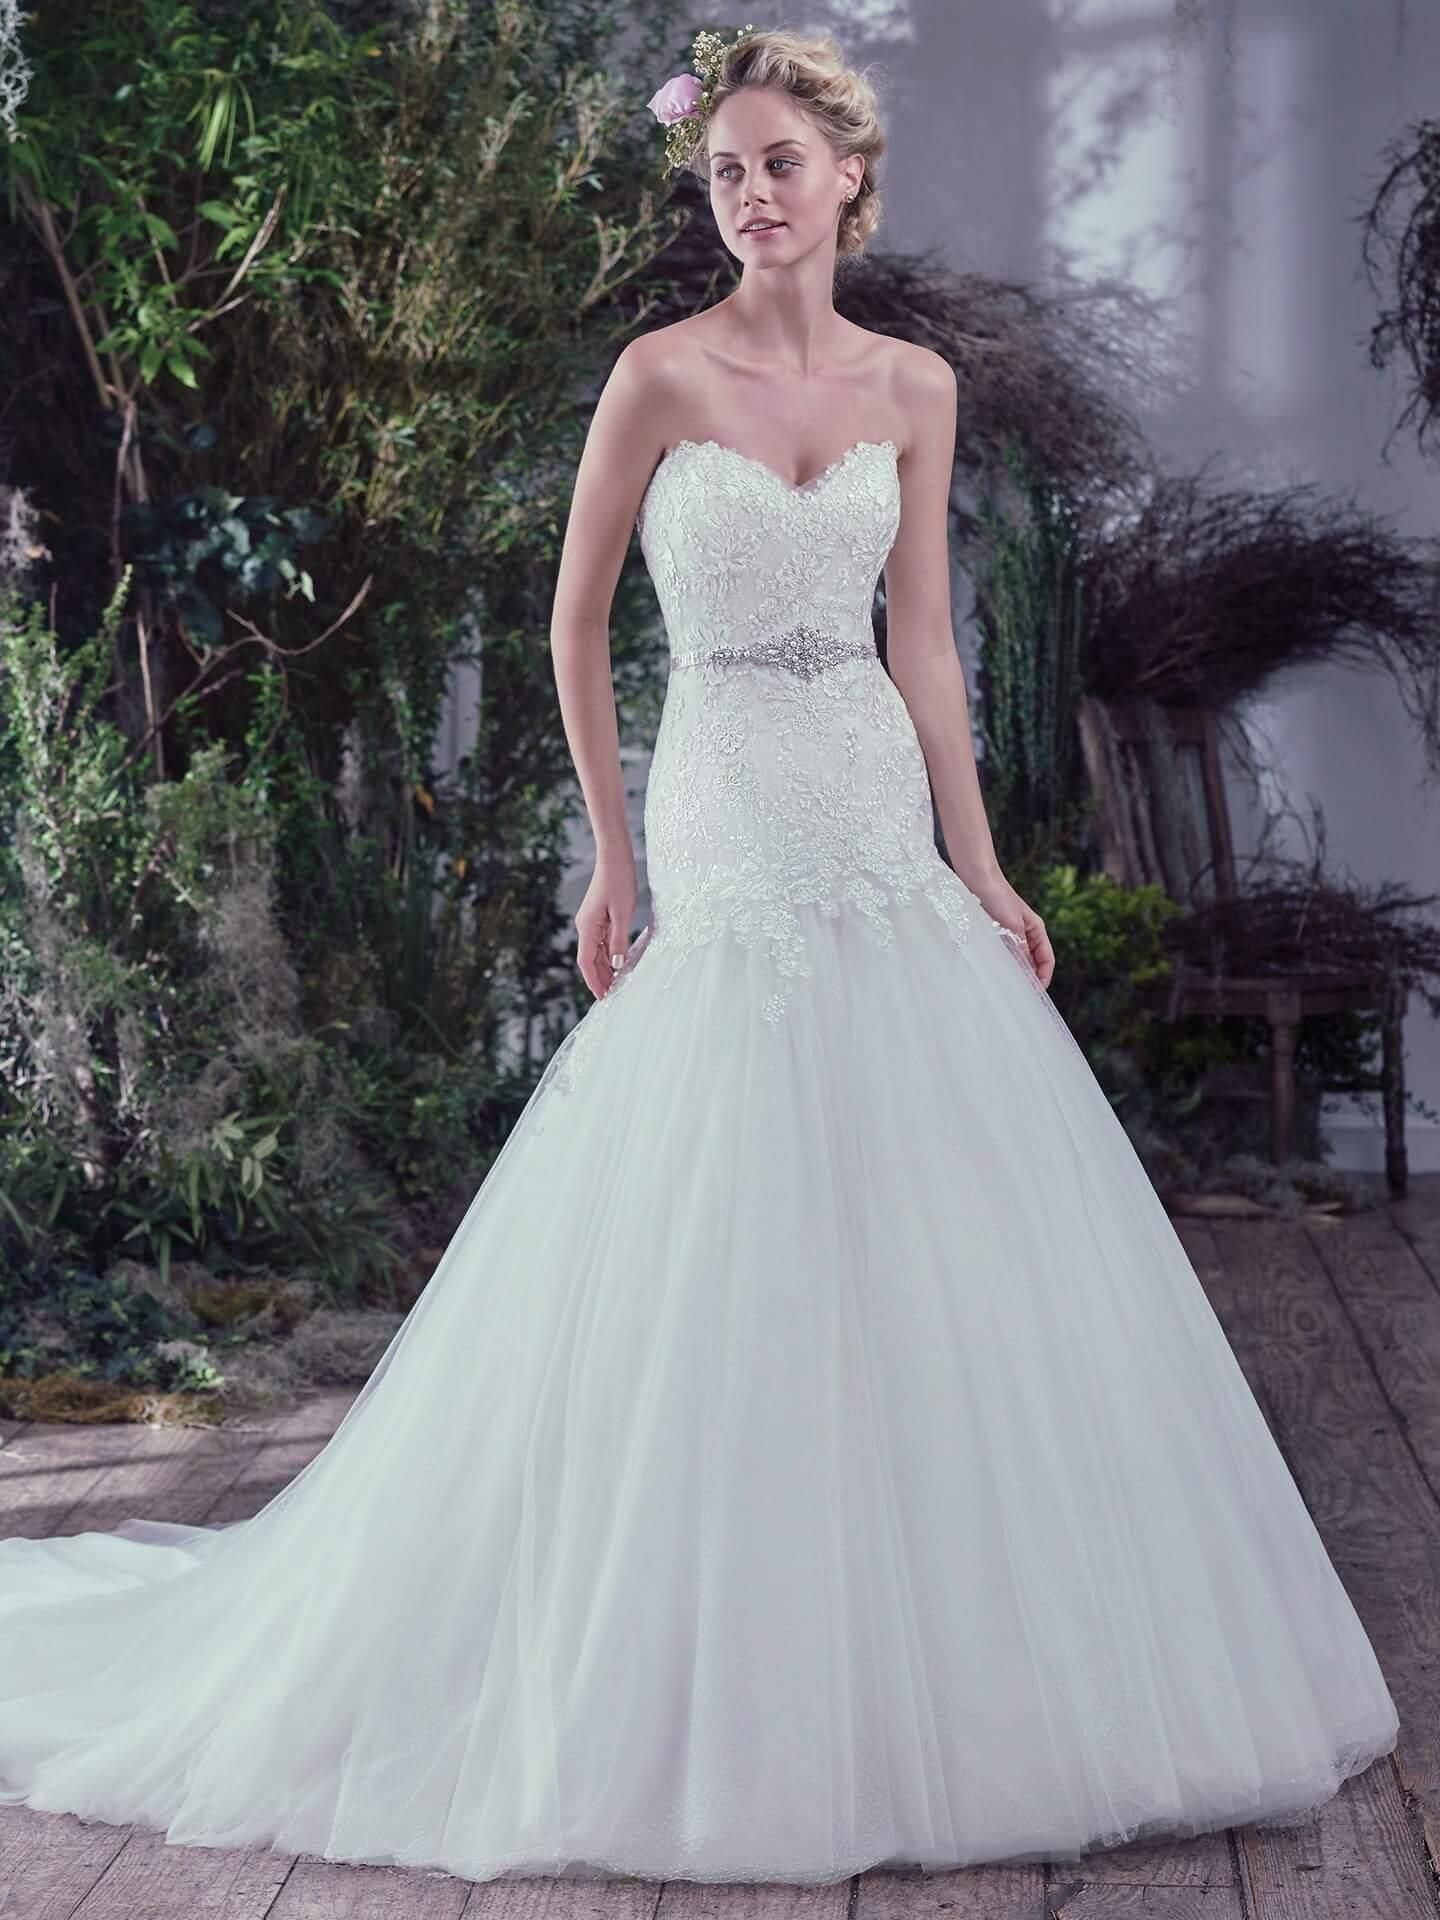 Funky Maggie Sottero Short Wedding Dresses Festooning - All Wedding ...